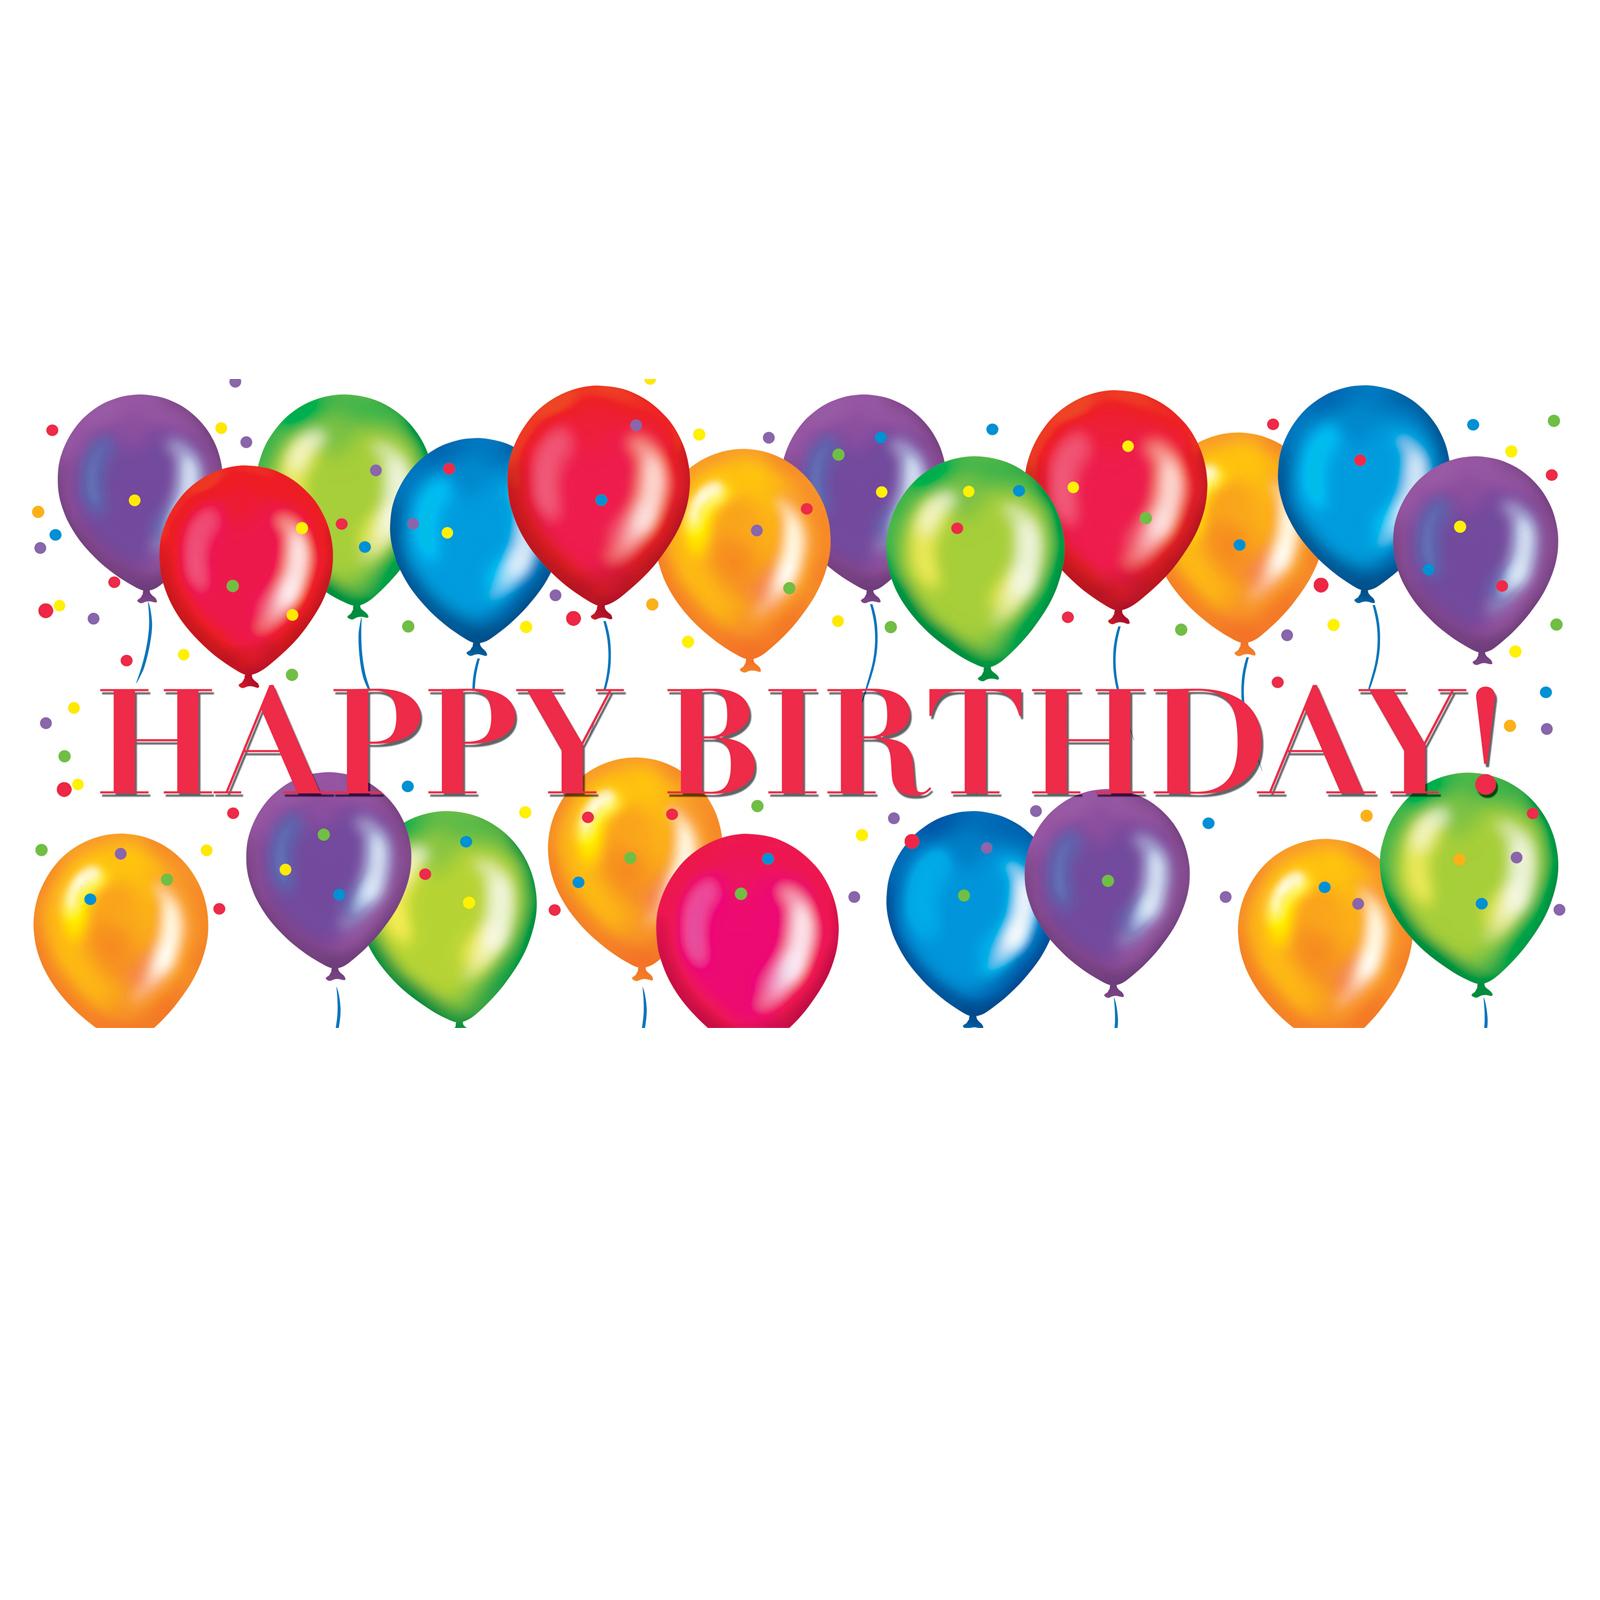 1600x1600 Birthday Balloons Clip Art Cake